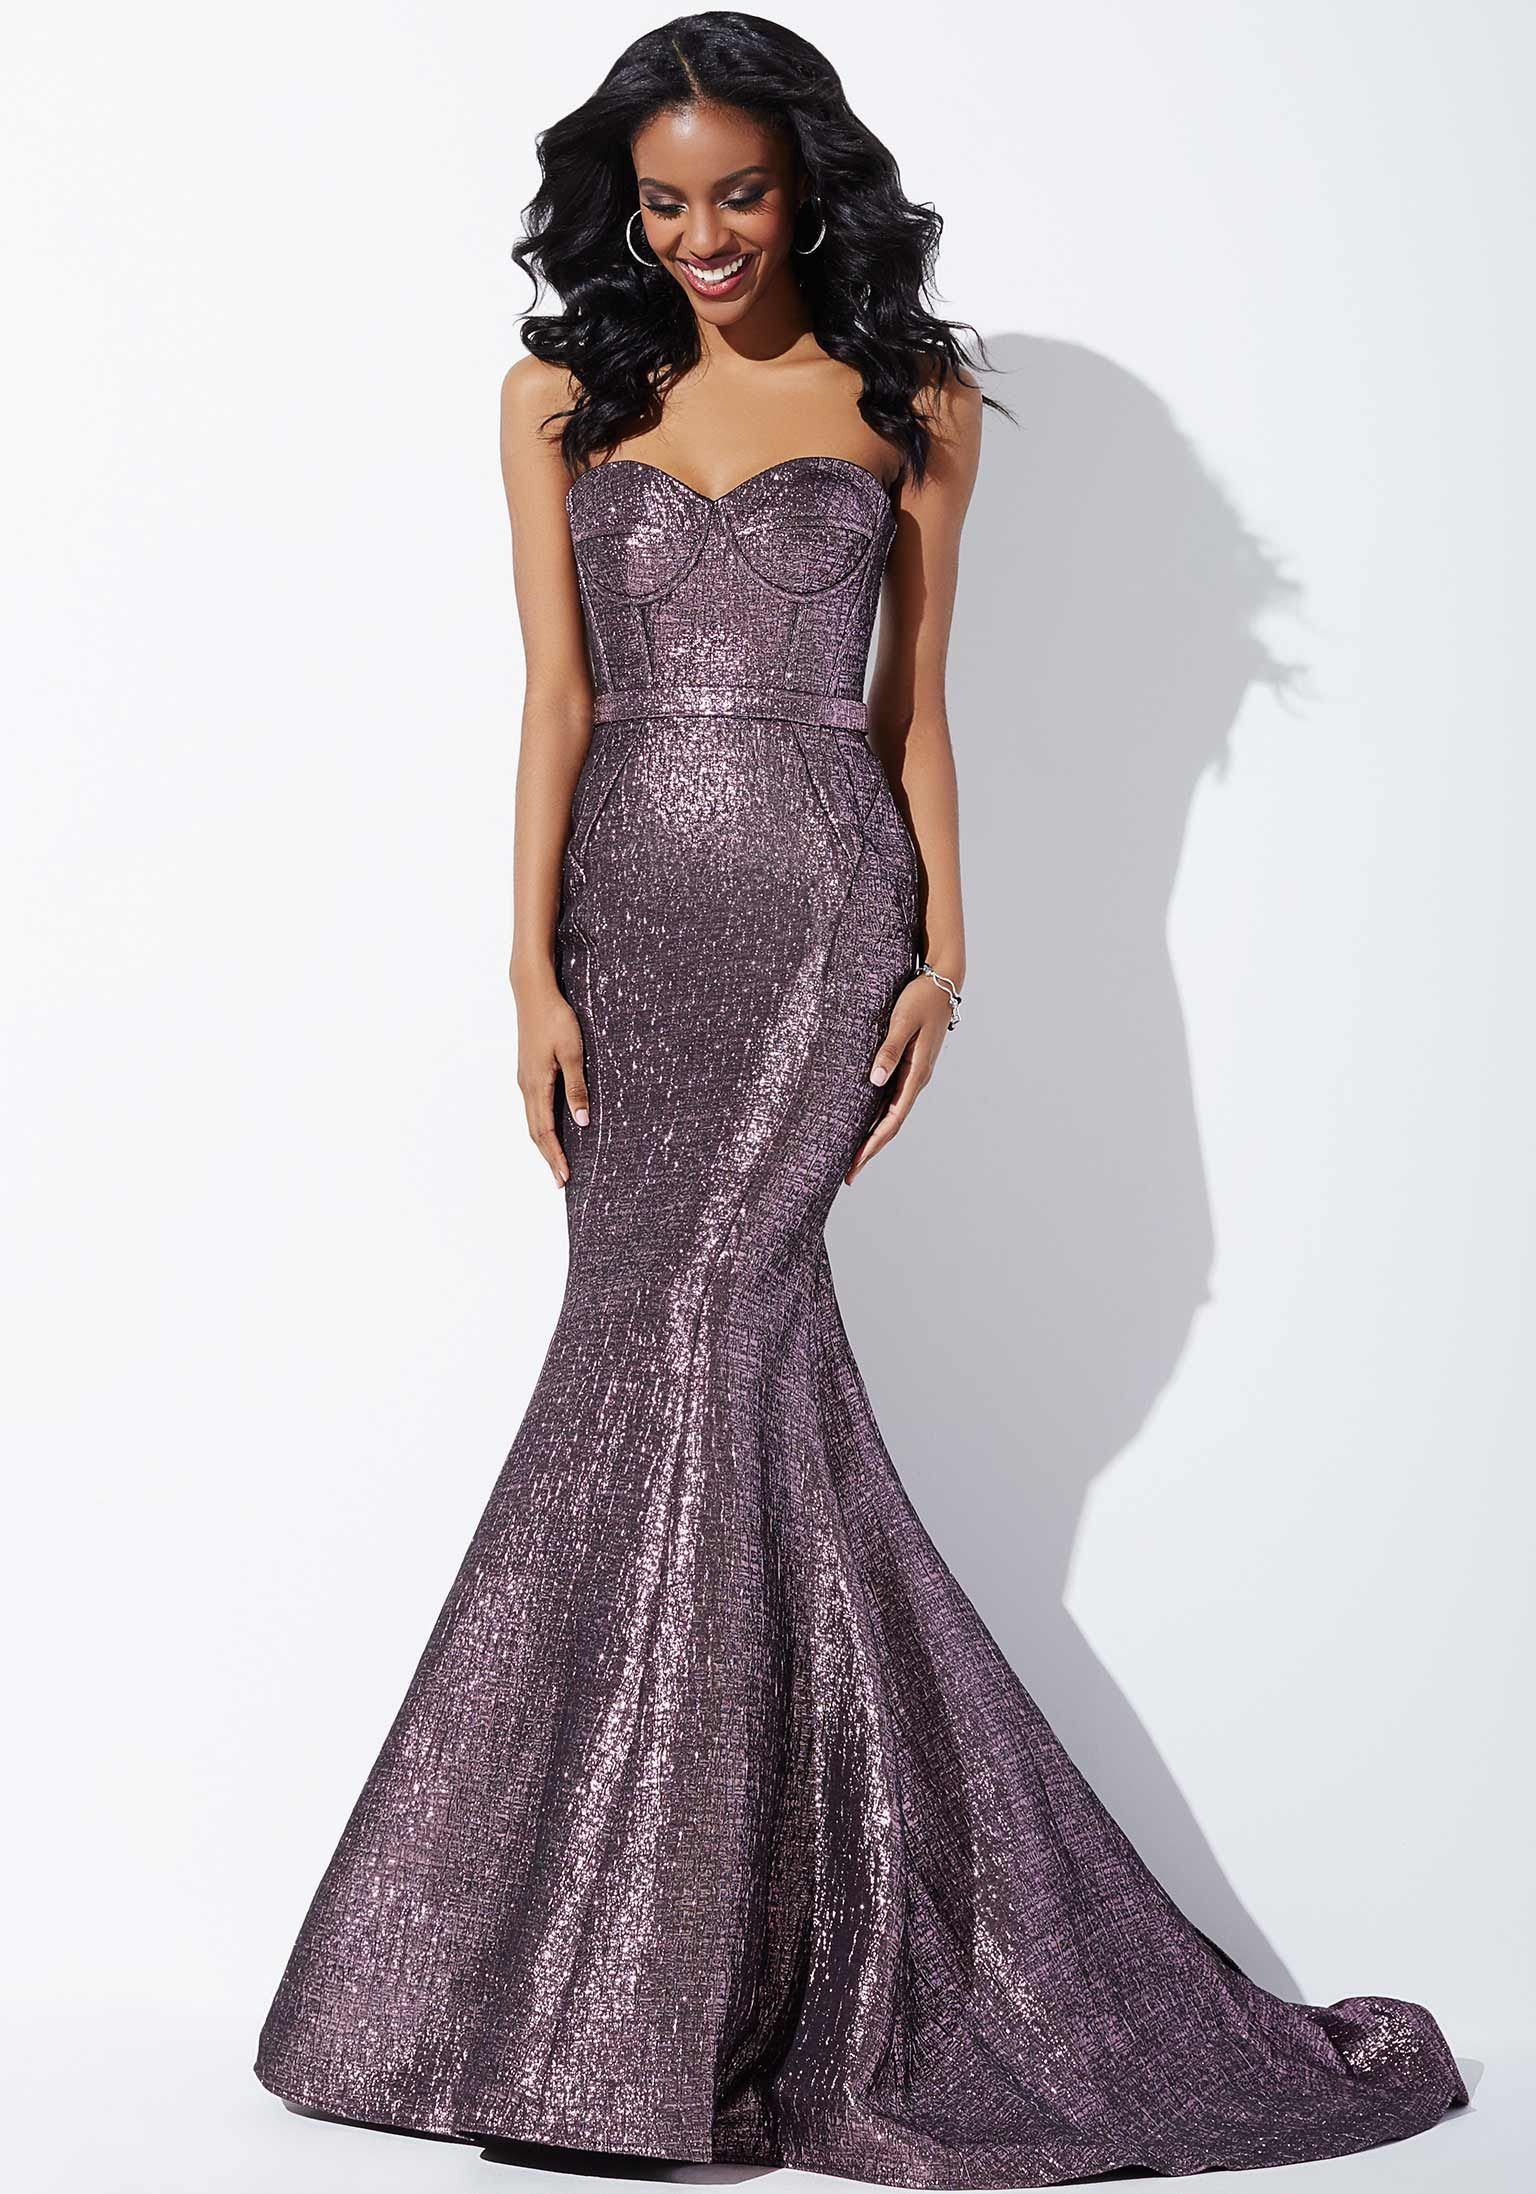 Silver Strapless Mermaid Prom Dress 32735 Mermaid Prom Dresses Dresses Purple Prom Dress [ 2194 x 1536 Pixel ]